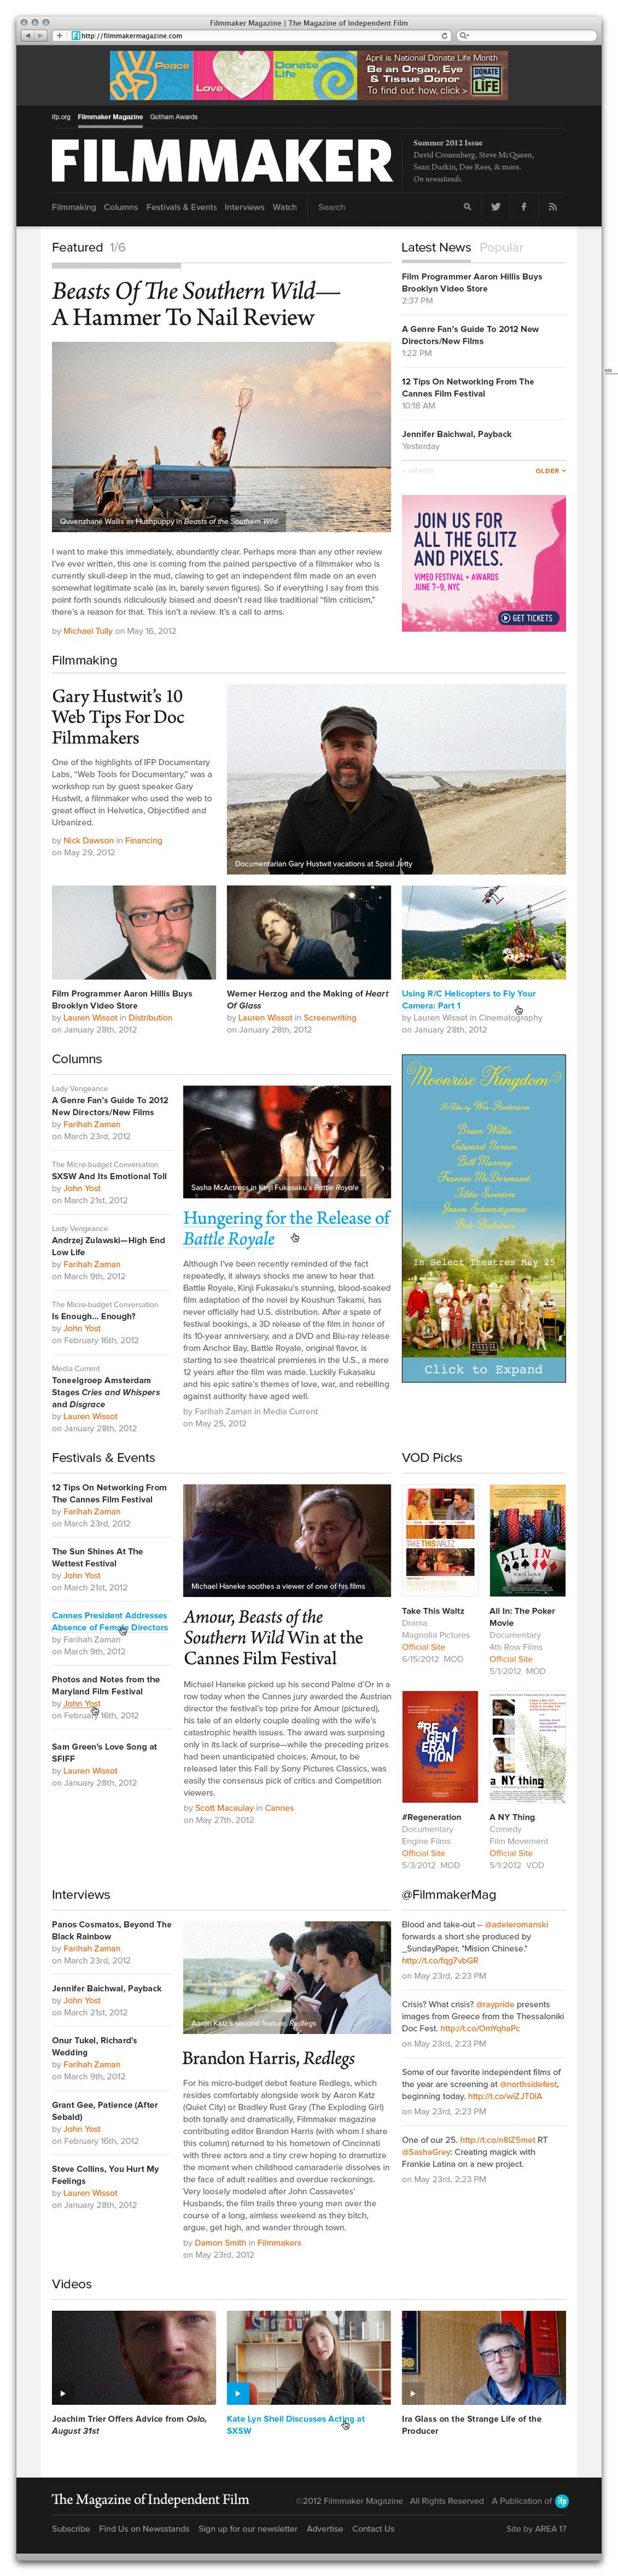 Filmmaker Magazine Homepage